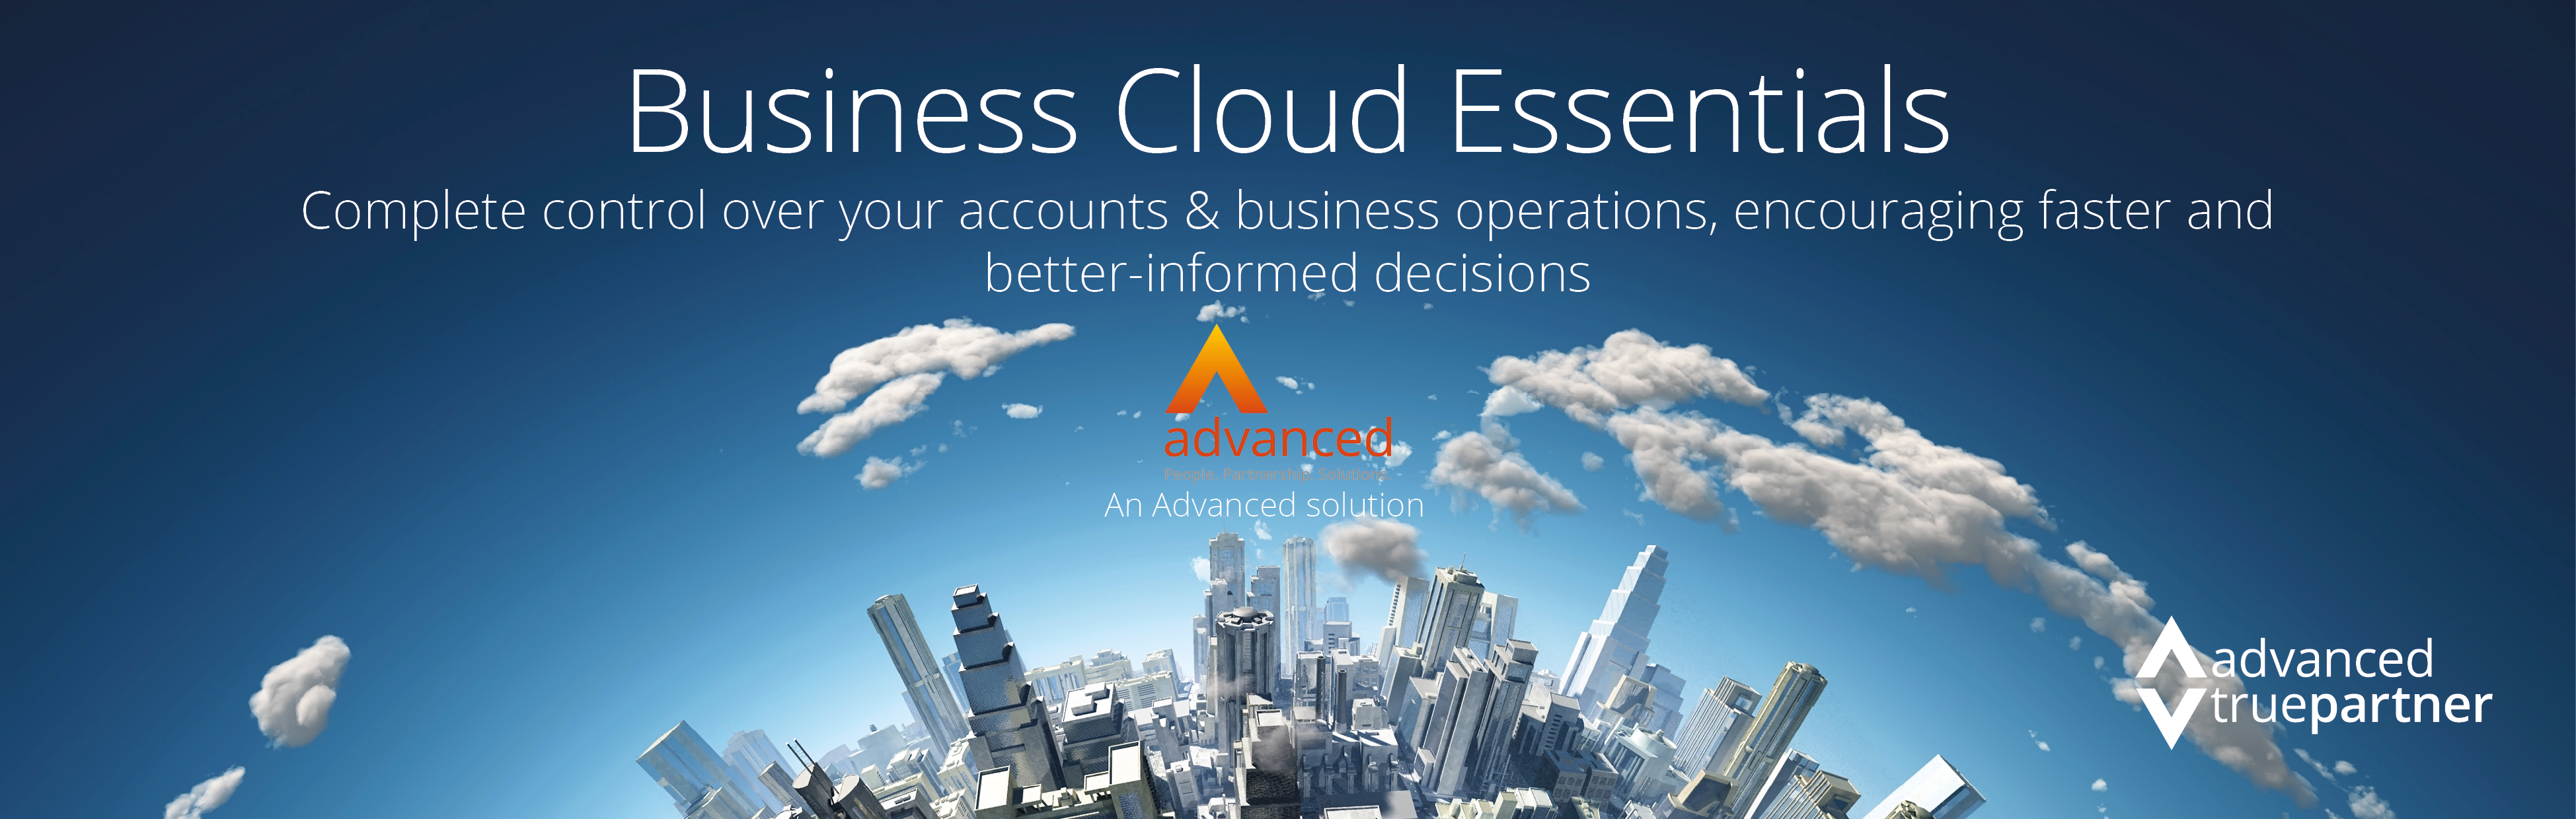 Advanced Business Cloud Essentials - Perrywell join Advanced TruePartner Programme